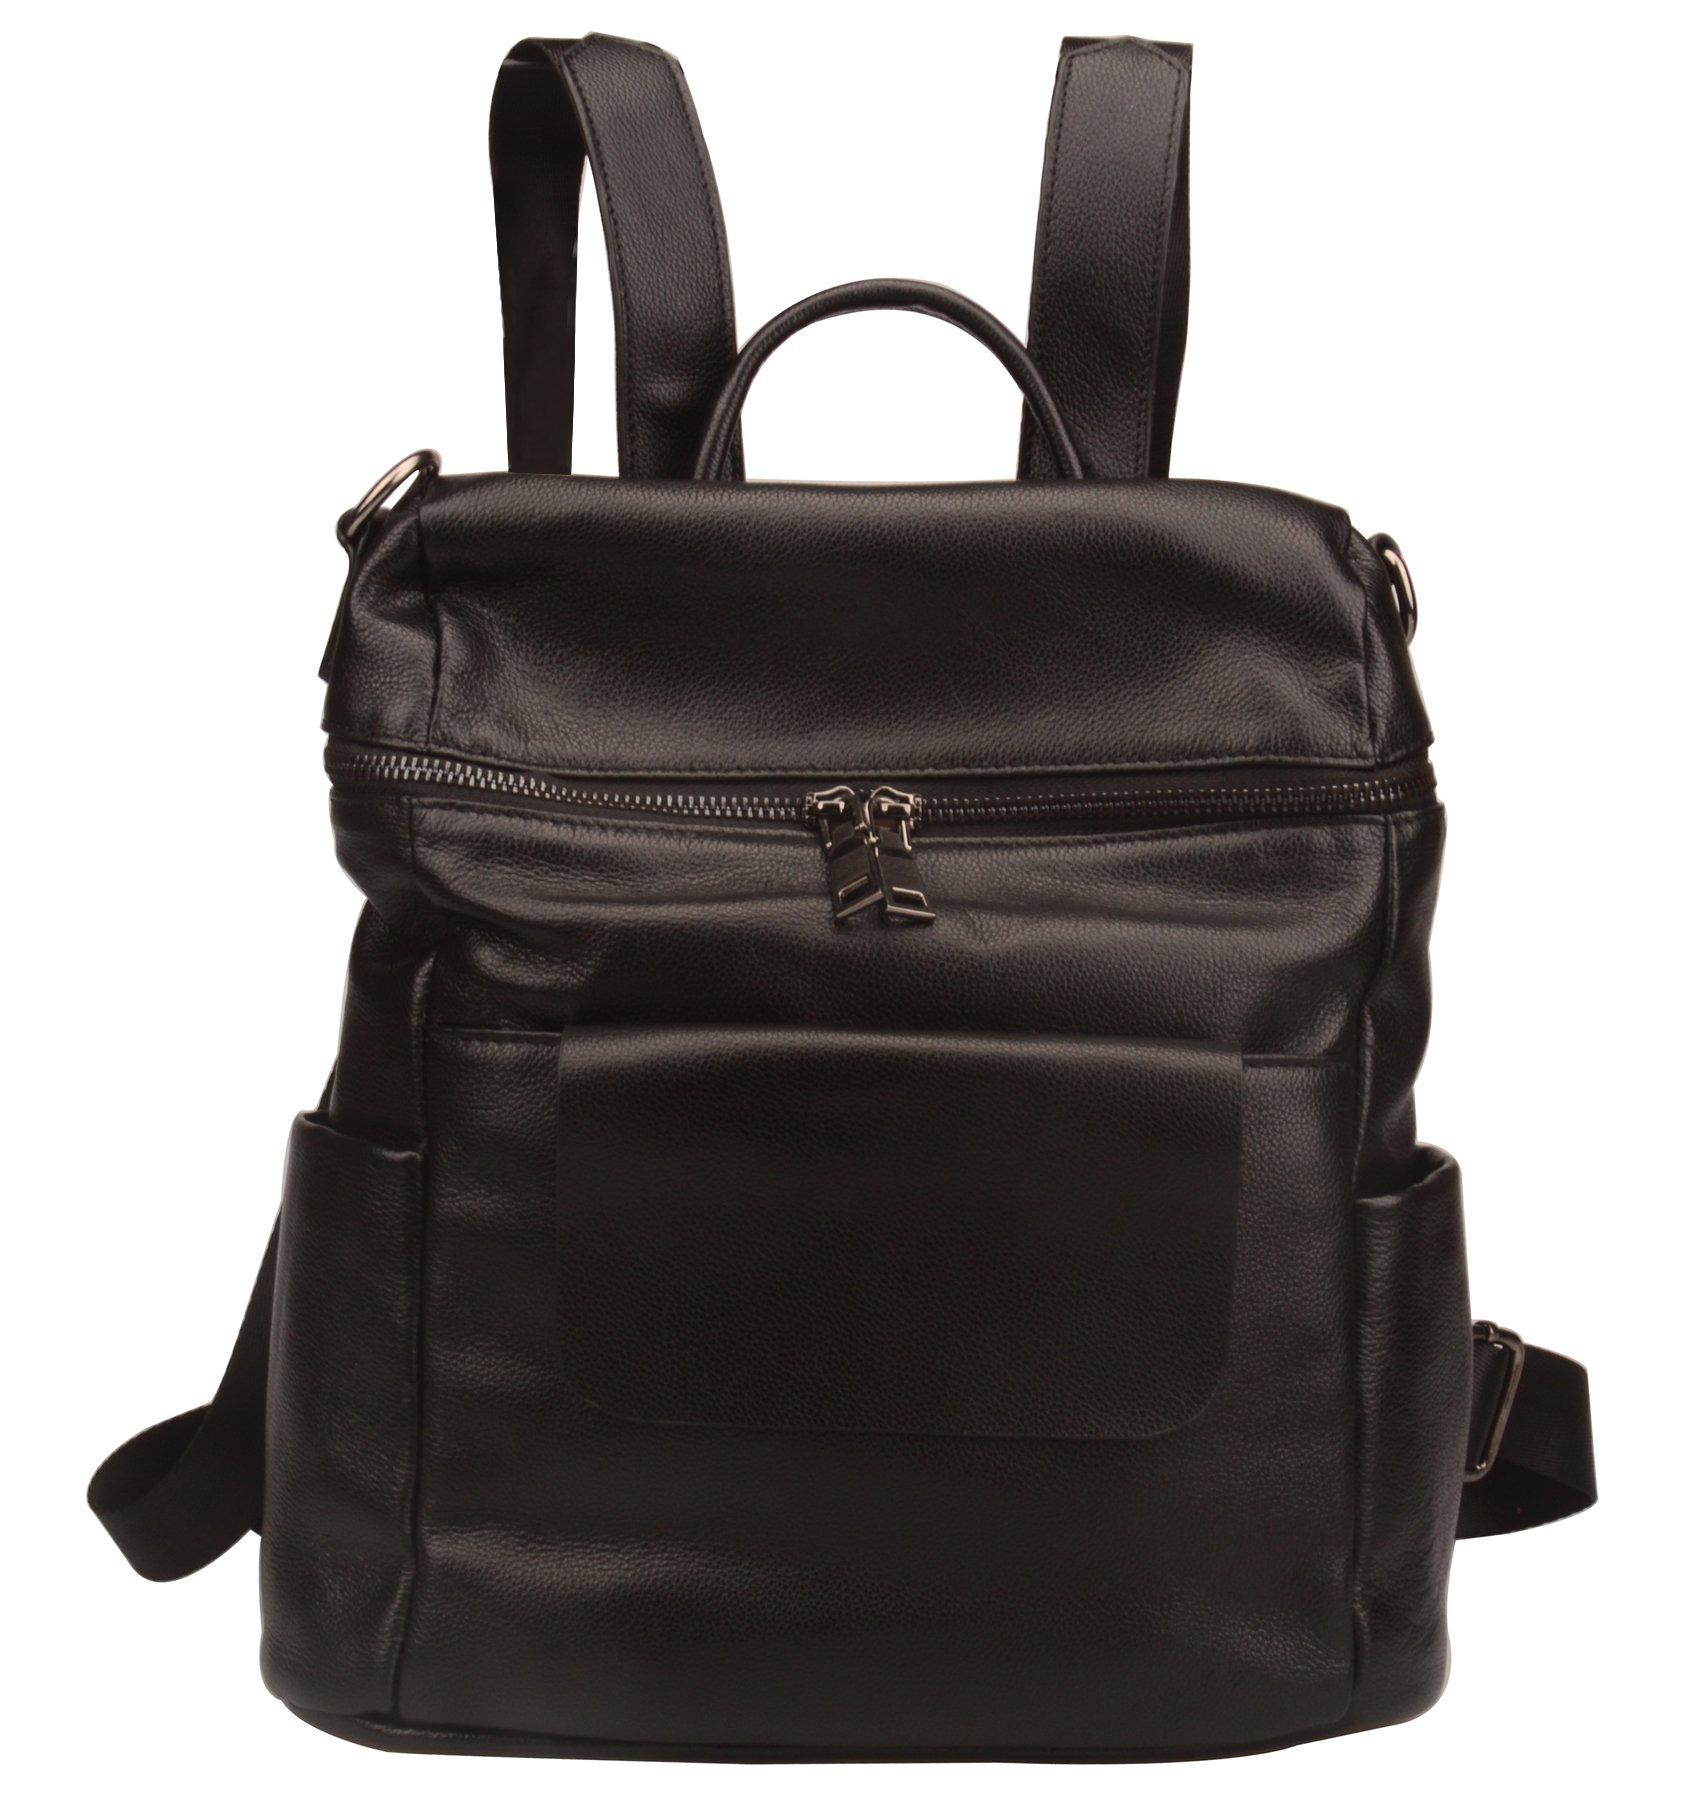 Fiswiss Women's Genuine Leather Fashion Backpack School Backpack Purse Handbags (Black)